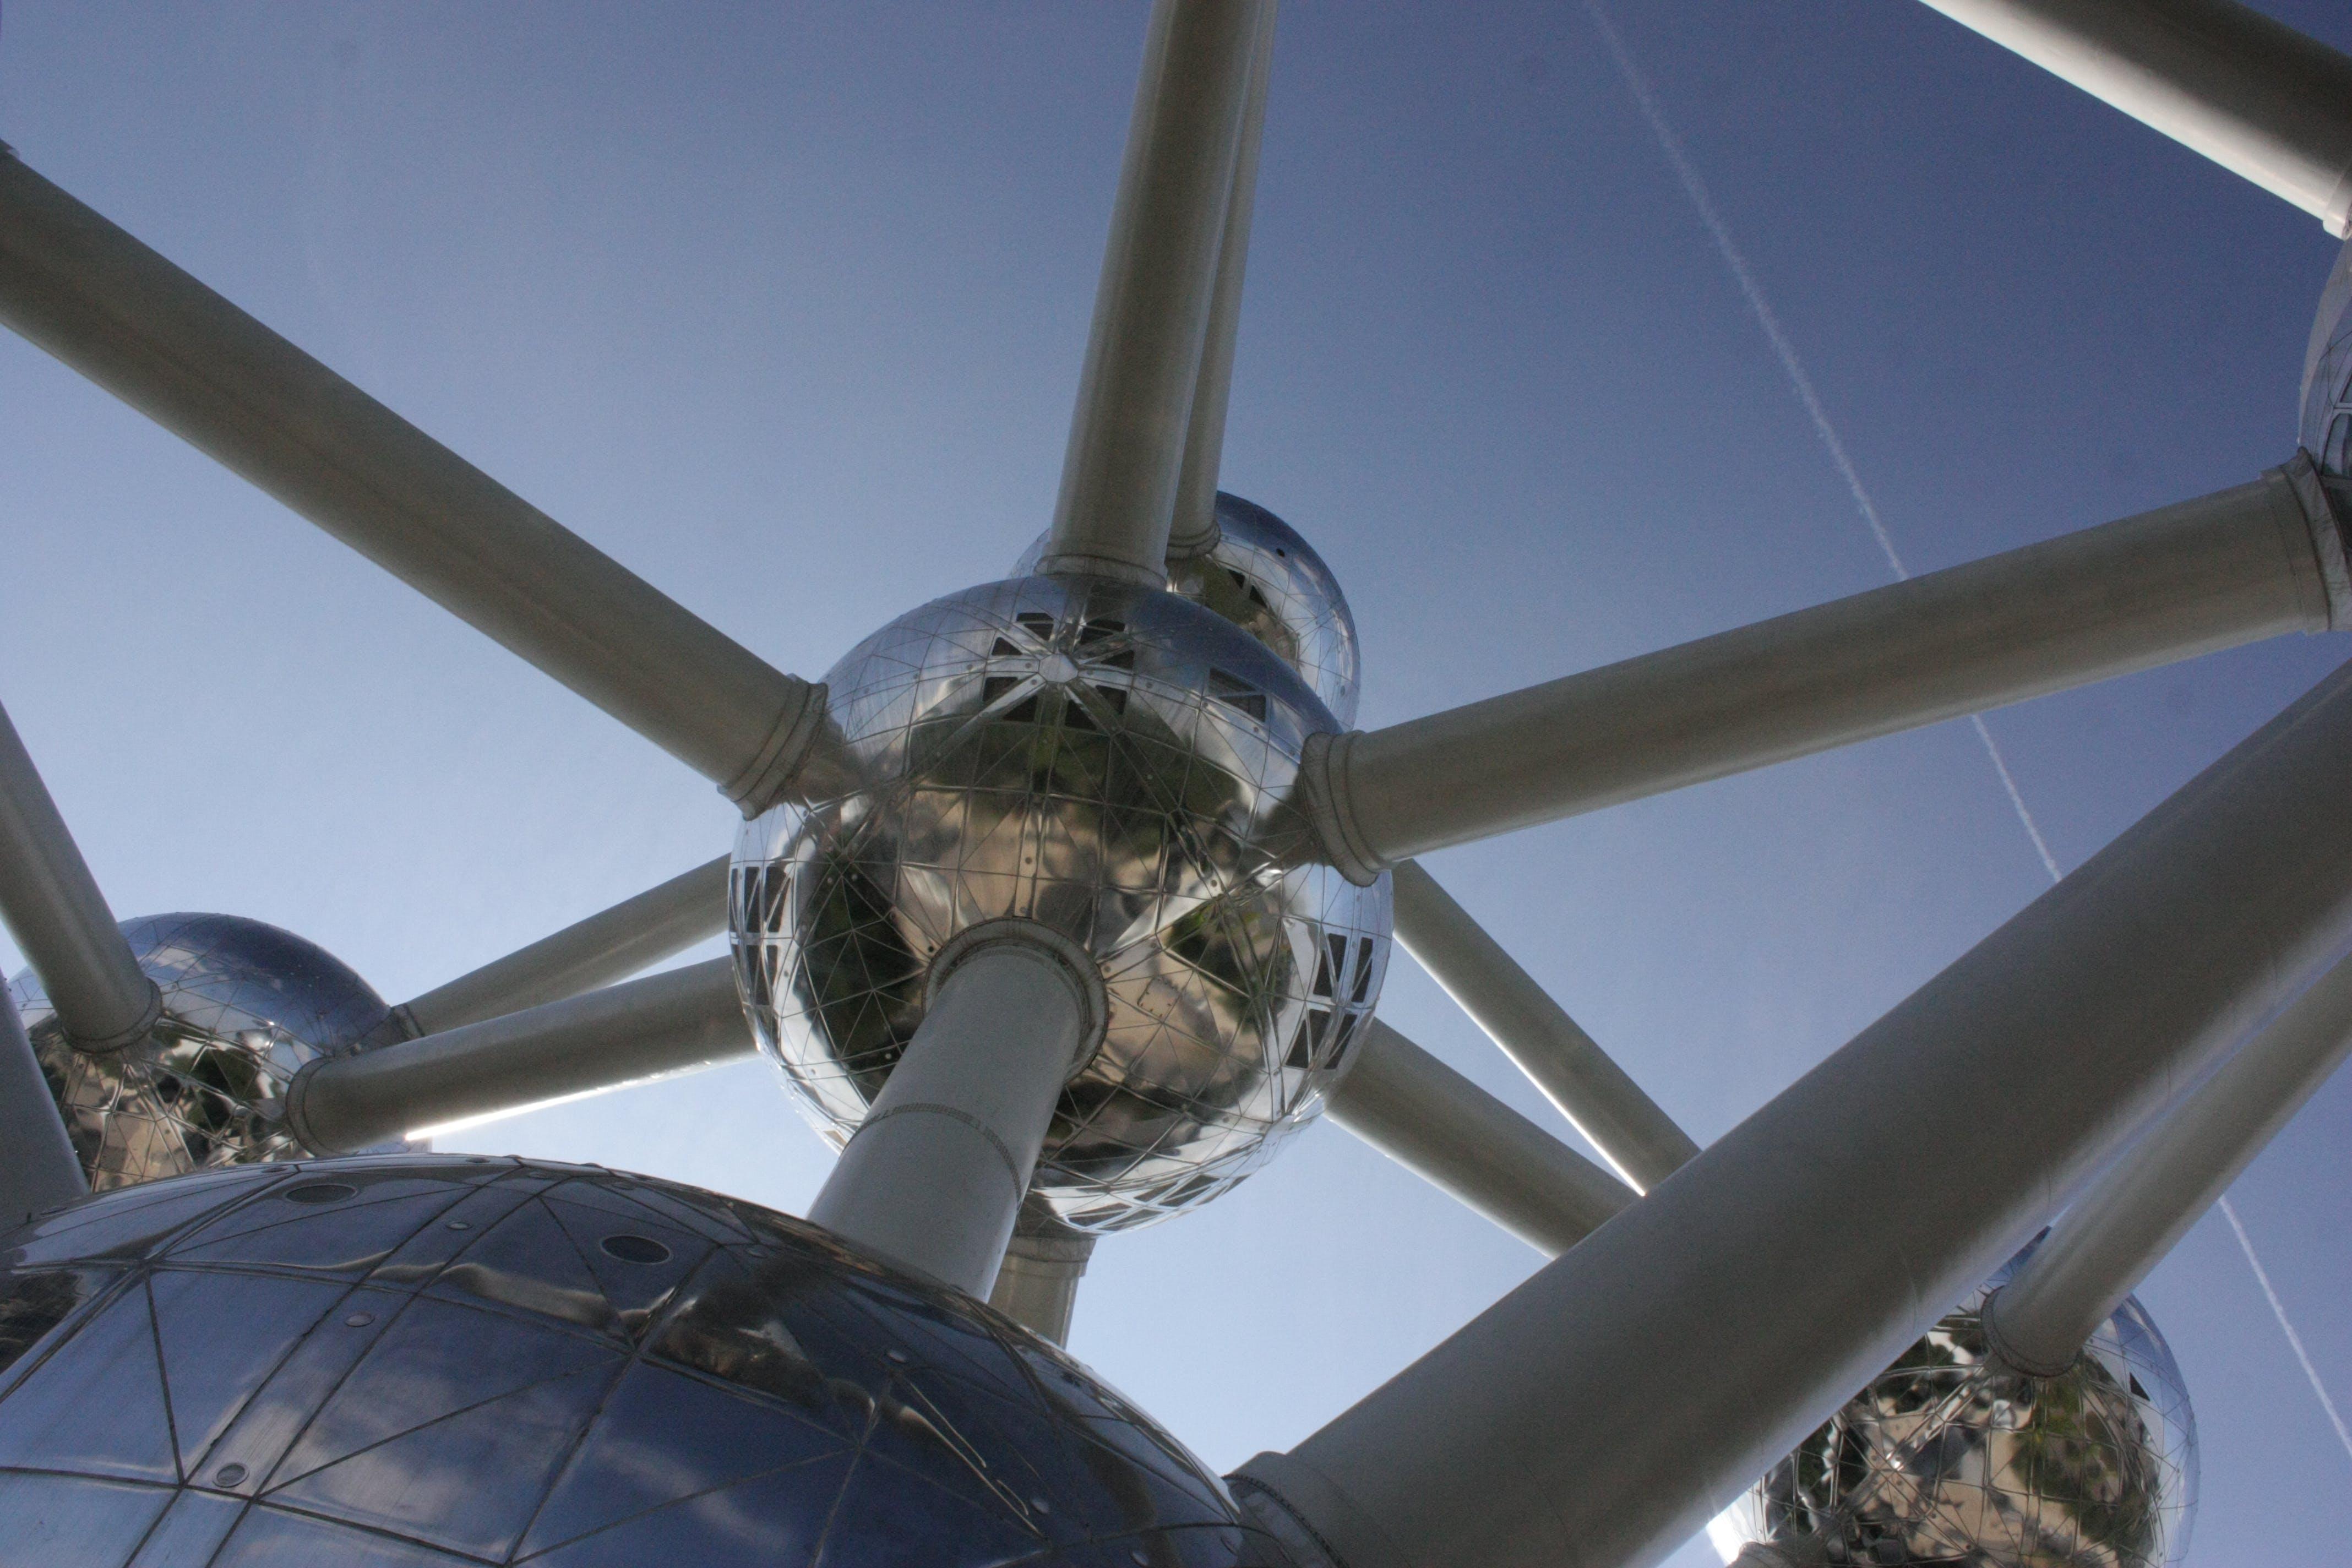 Fotos de stock gratuitas de atomium, Bélgica, bruselas, Monumento